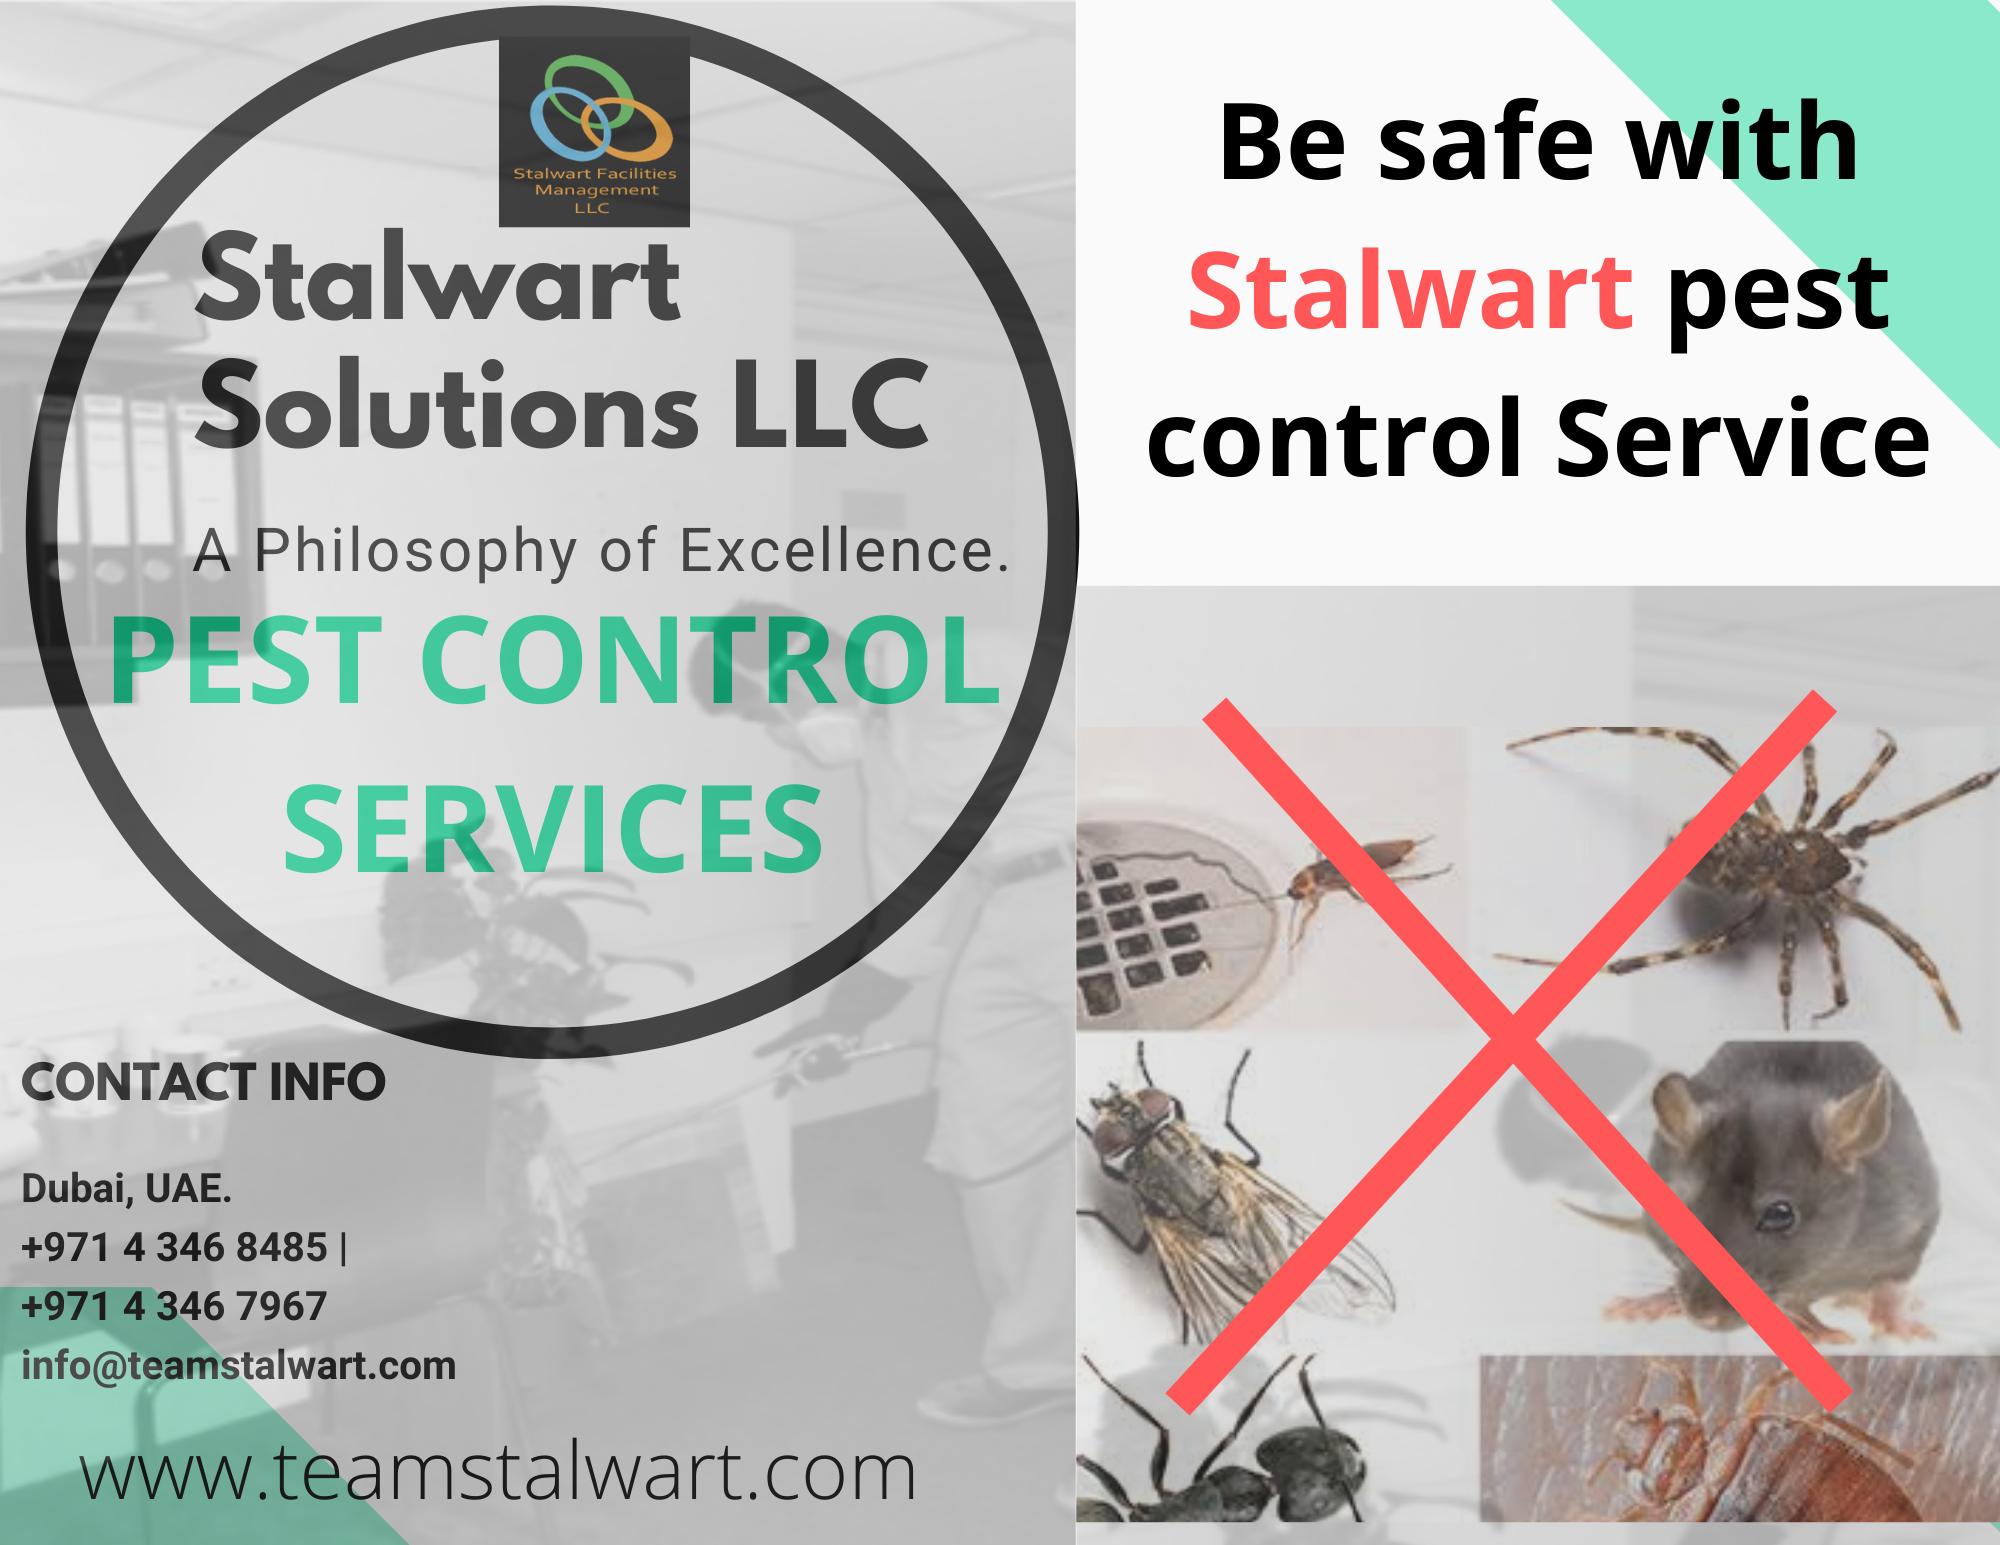 Municipality Approved Pest Control Services Company Dubai